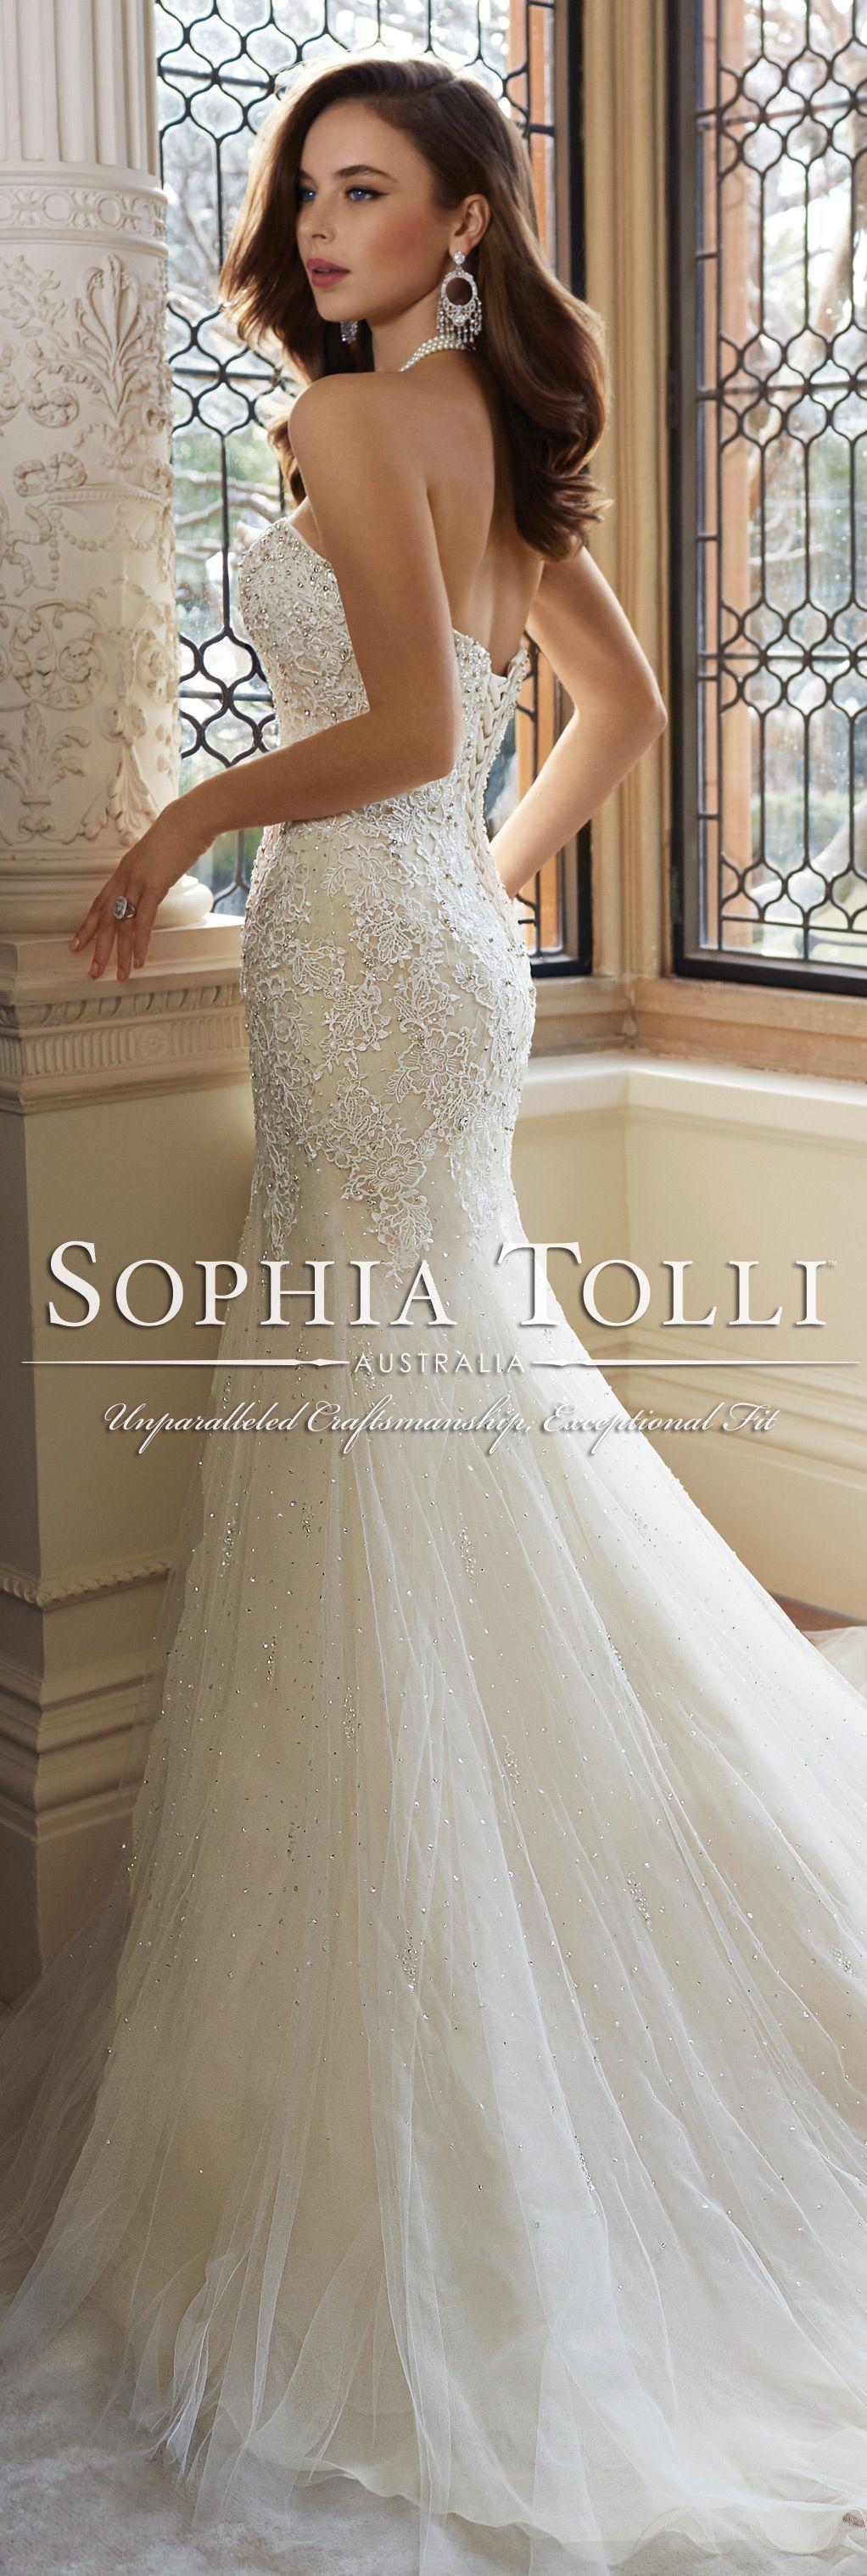 The Sophia Tolli Spring 2016 Wedding Dress Collection Style No Y11625 Amira Laceweddingdress: Y11625 Sophia Tolli Wedding Dresses At Reisefeber.org